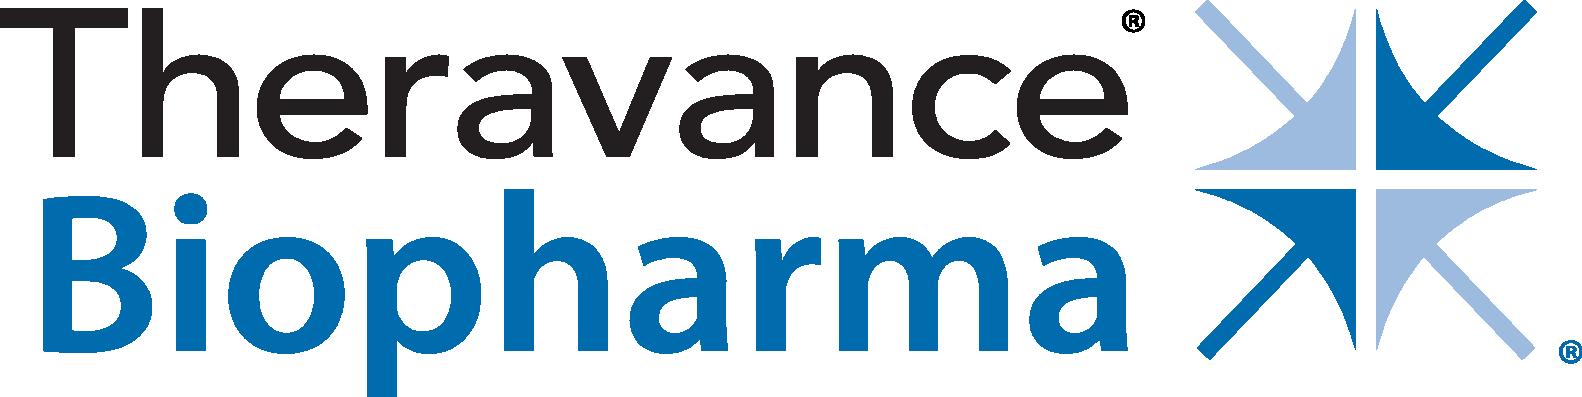 theravance-biopharmamrsa.png